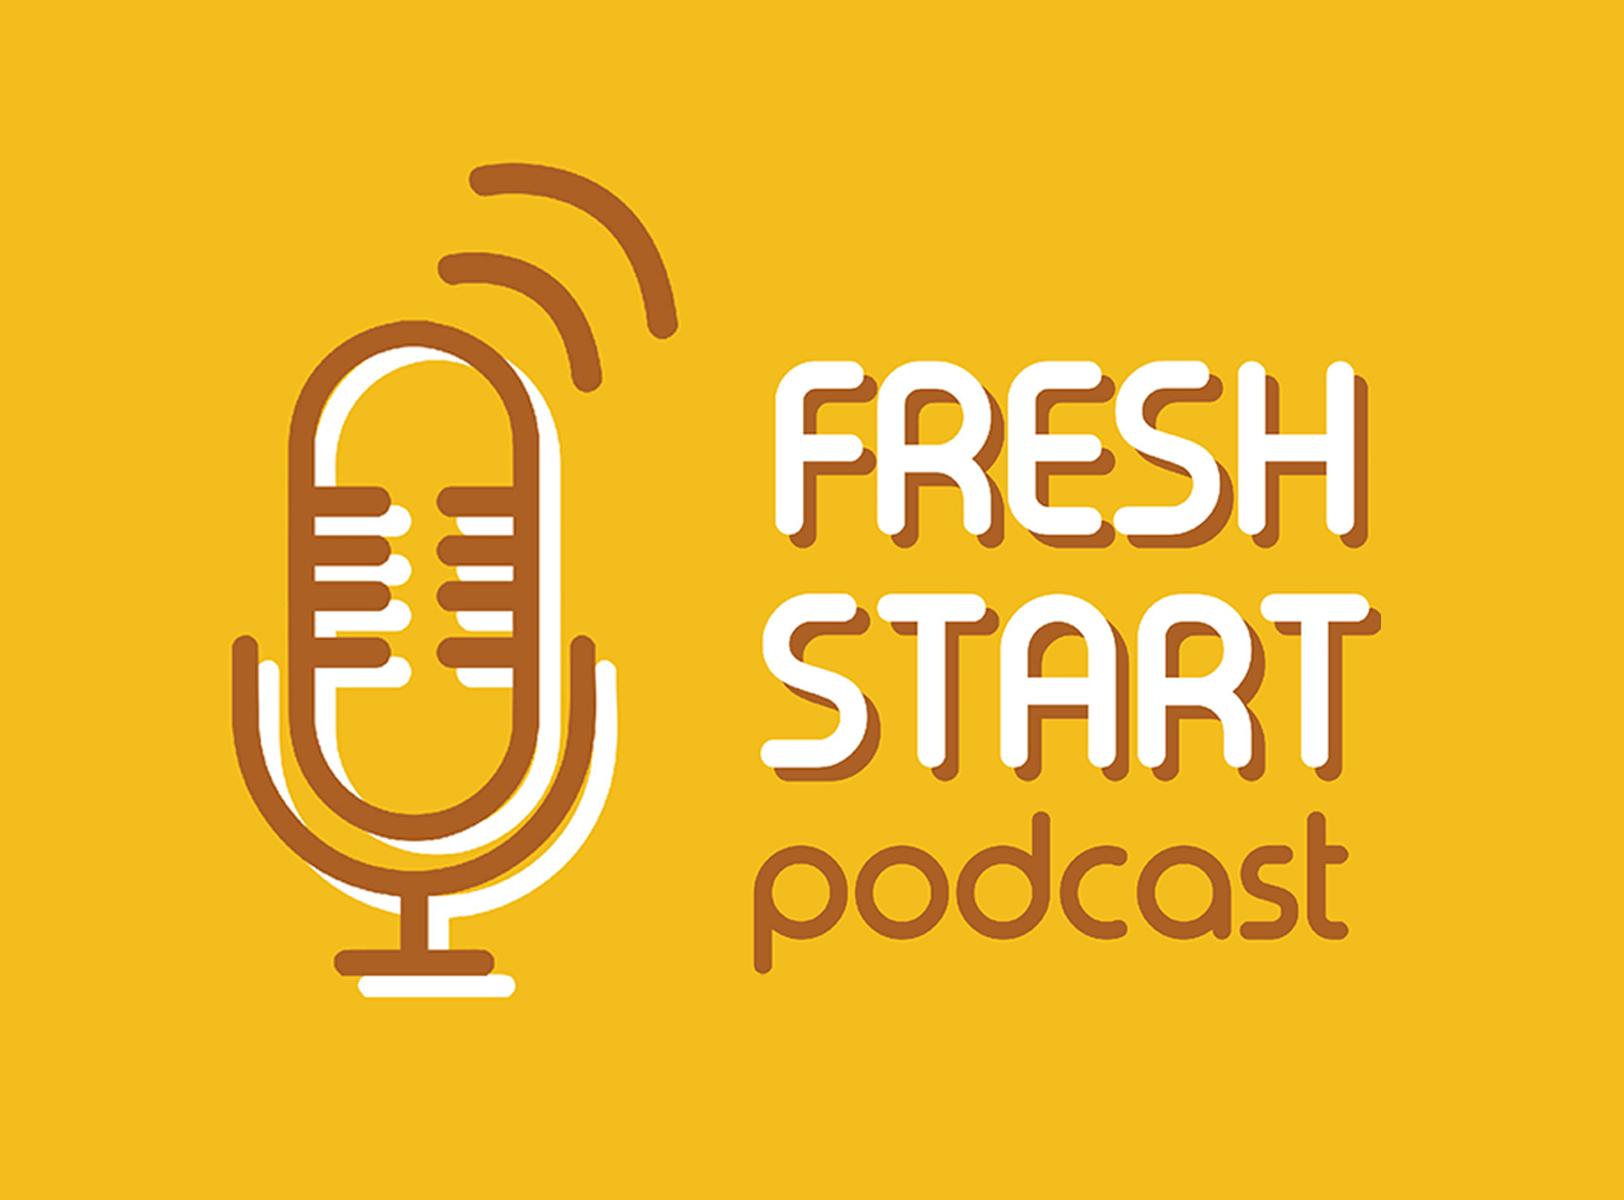 Fresh Start: Podcast News (12/5/2018 Wed.)